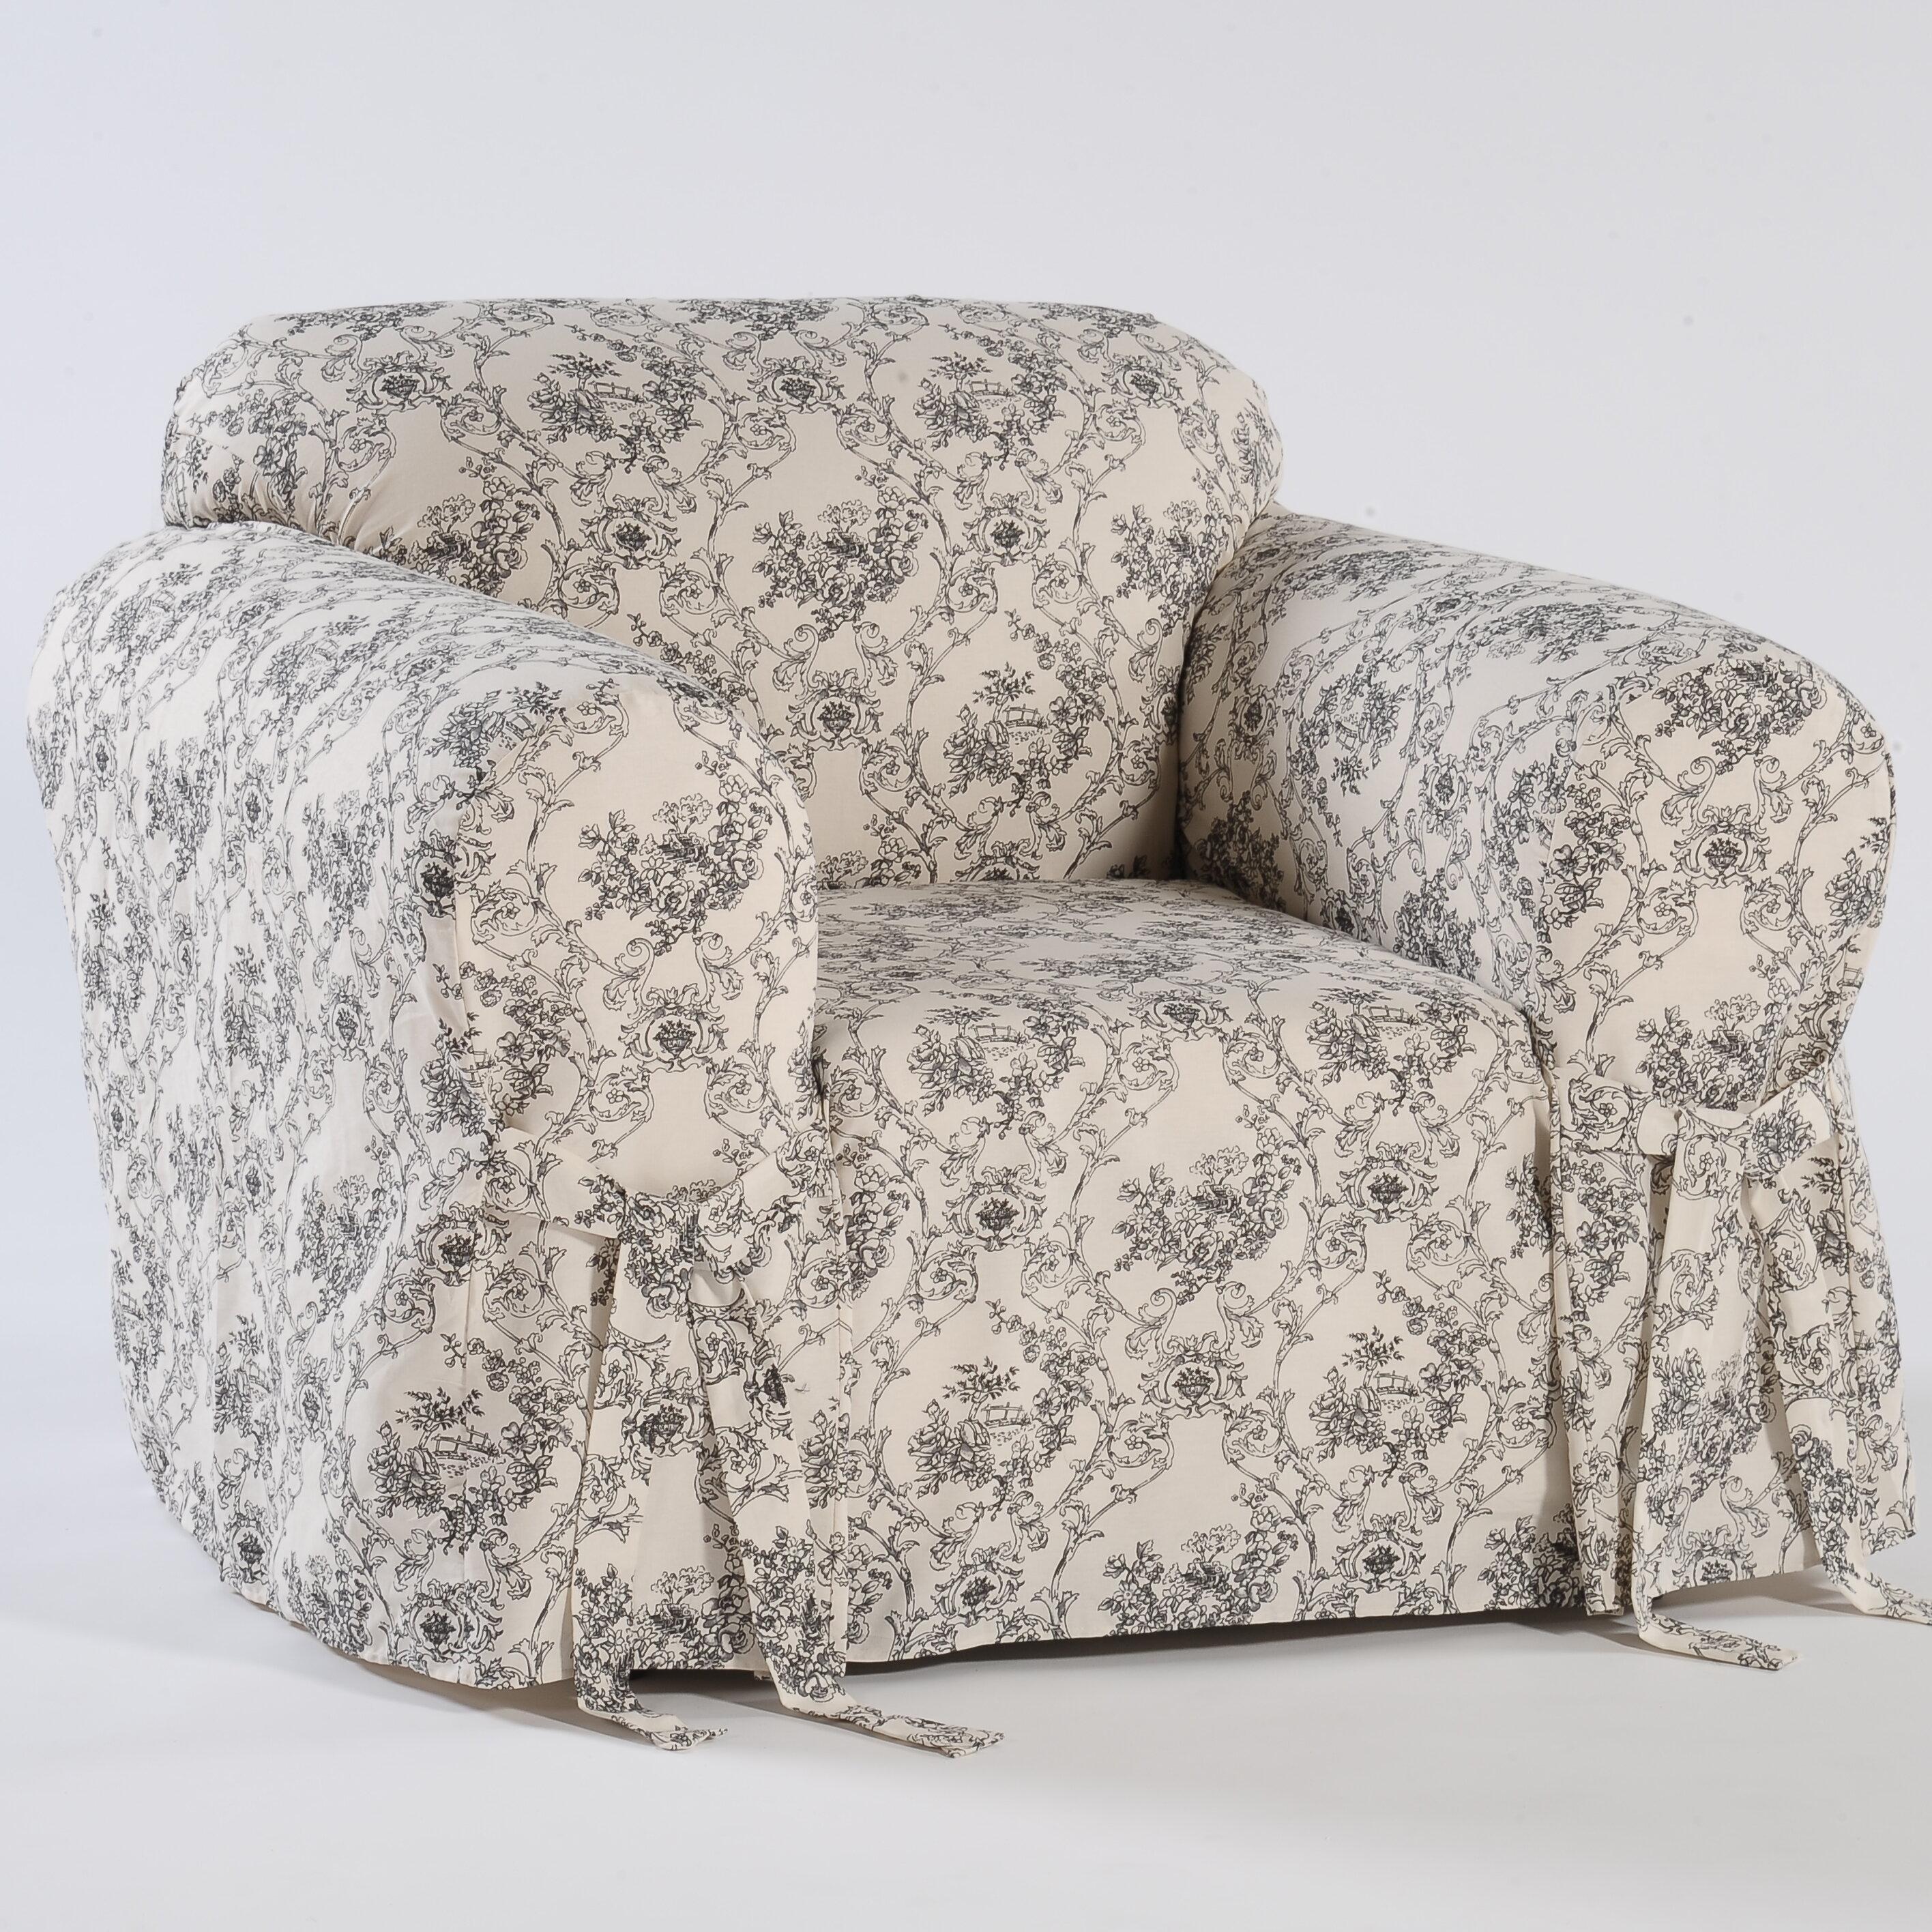 Bon Classic Slipcovers Toile Print Box Cushion Armchair Slipcover U0026 Reviews |  Wayfair